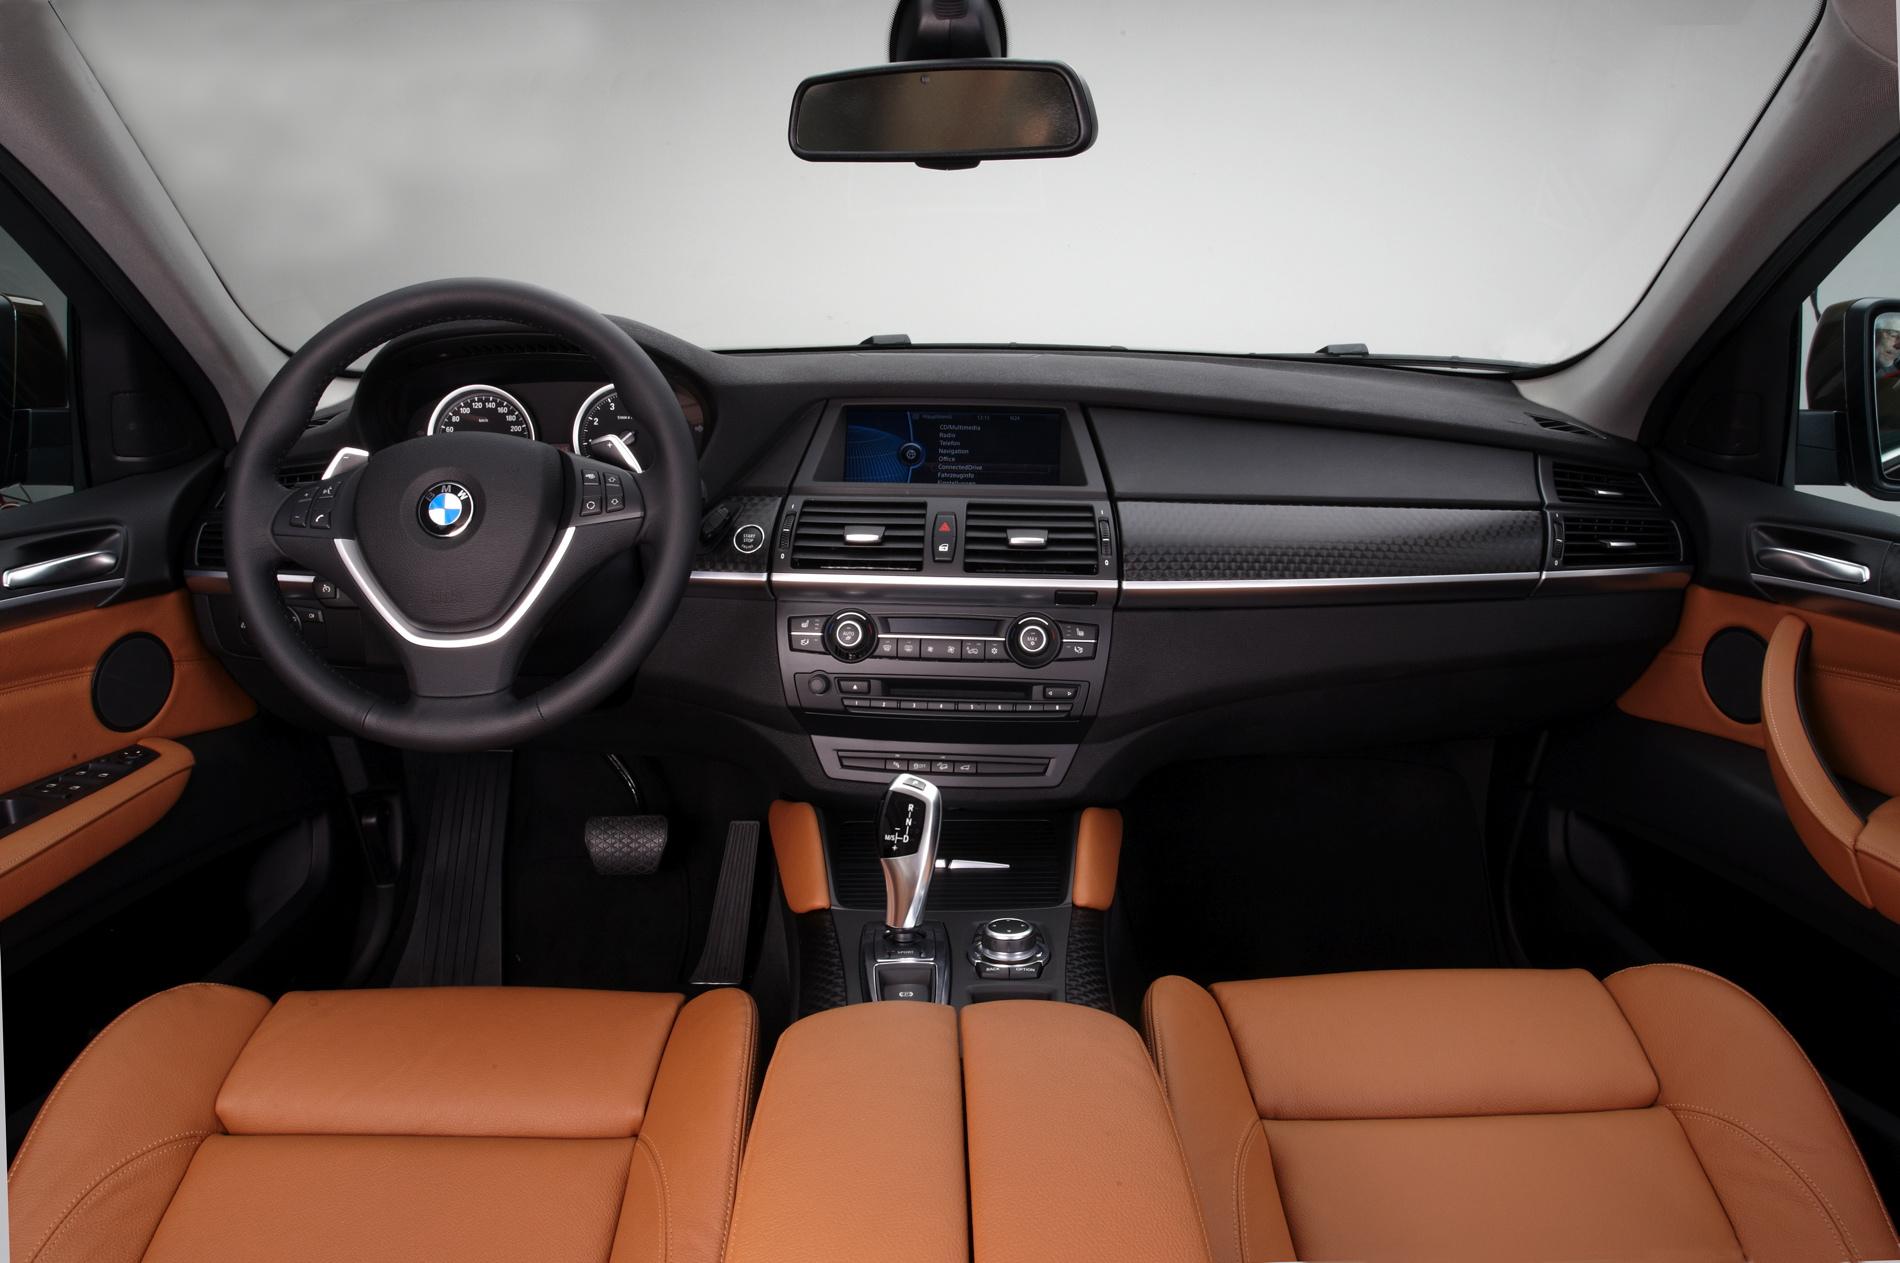 BMW X6 M I (E71) Restyling 2012 - 2014 SUV 5 door #2